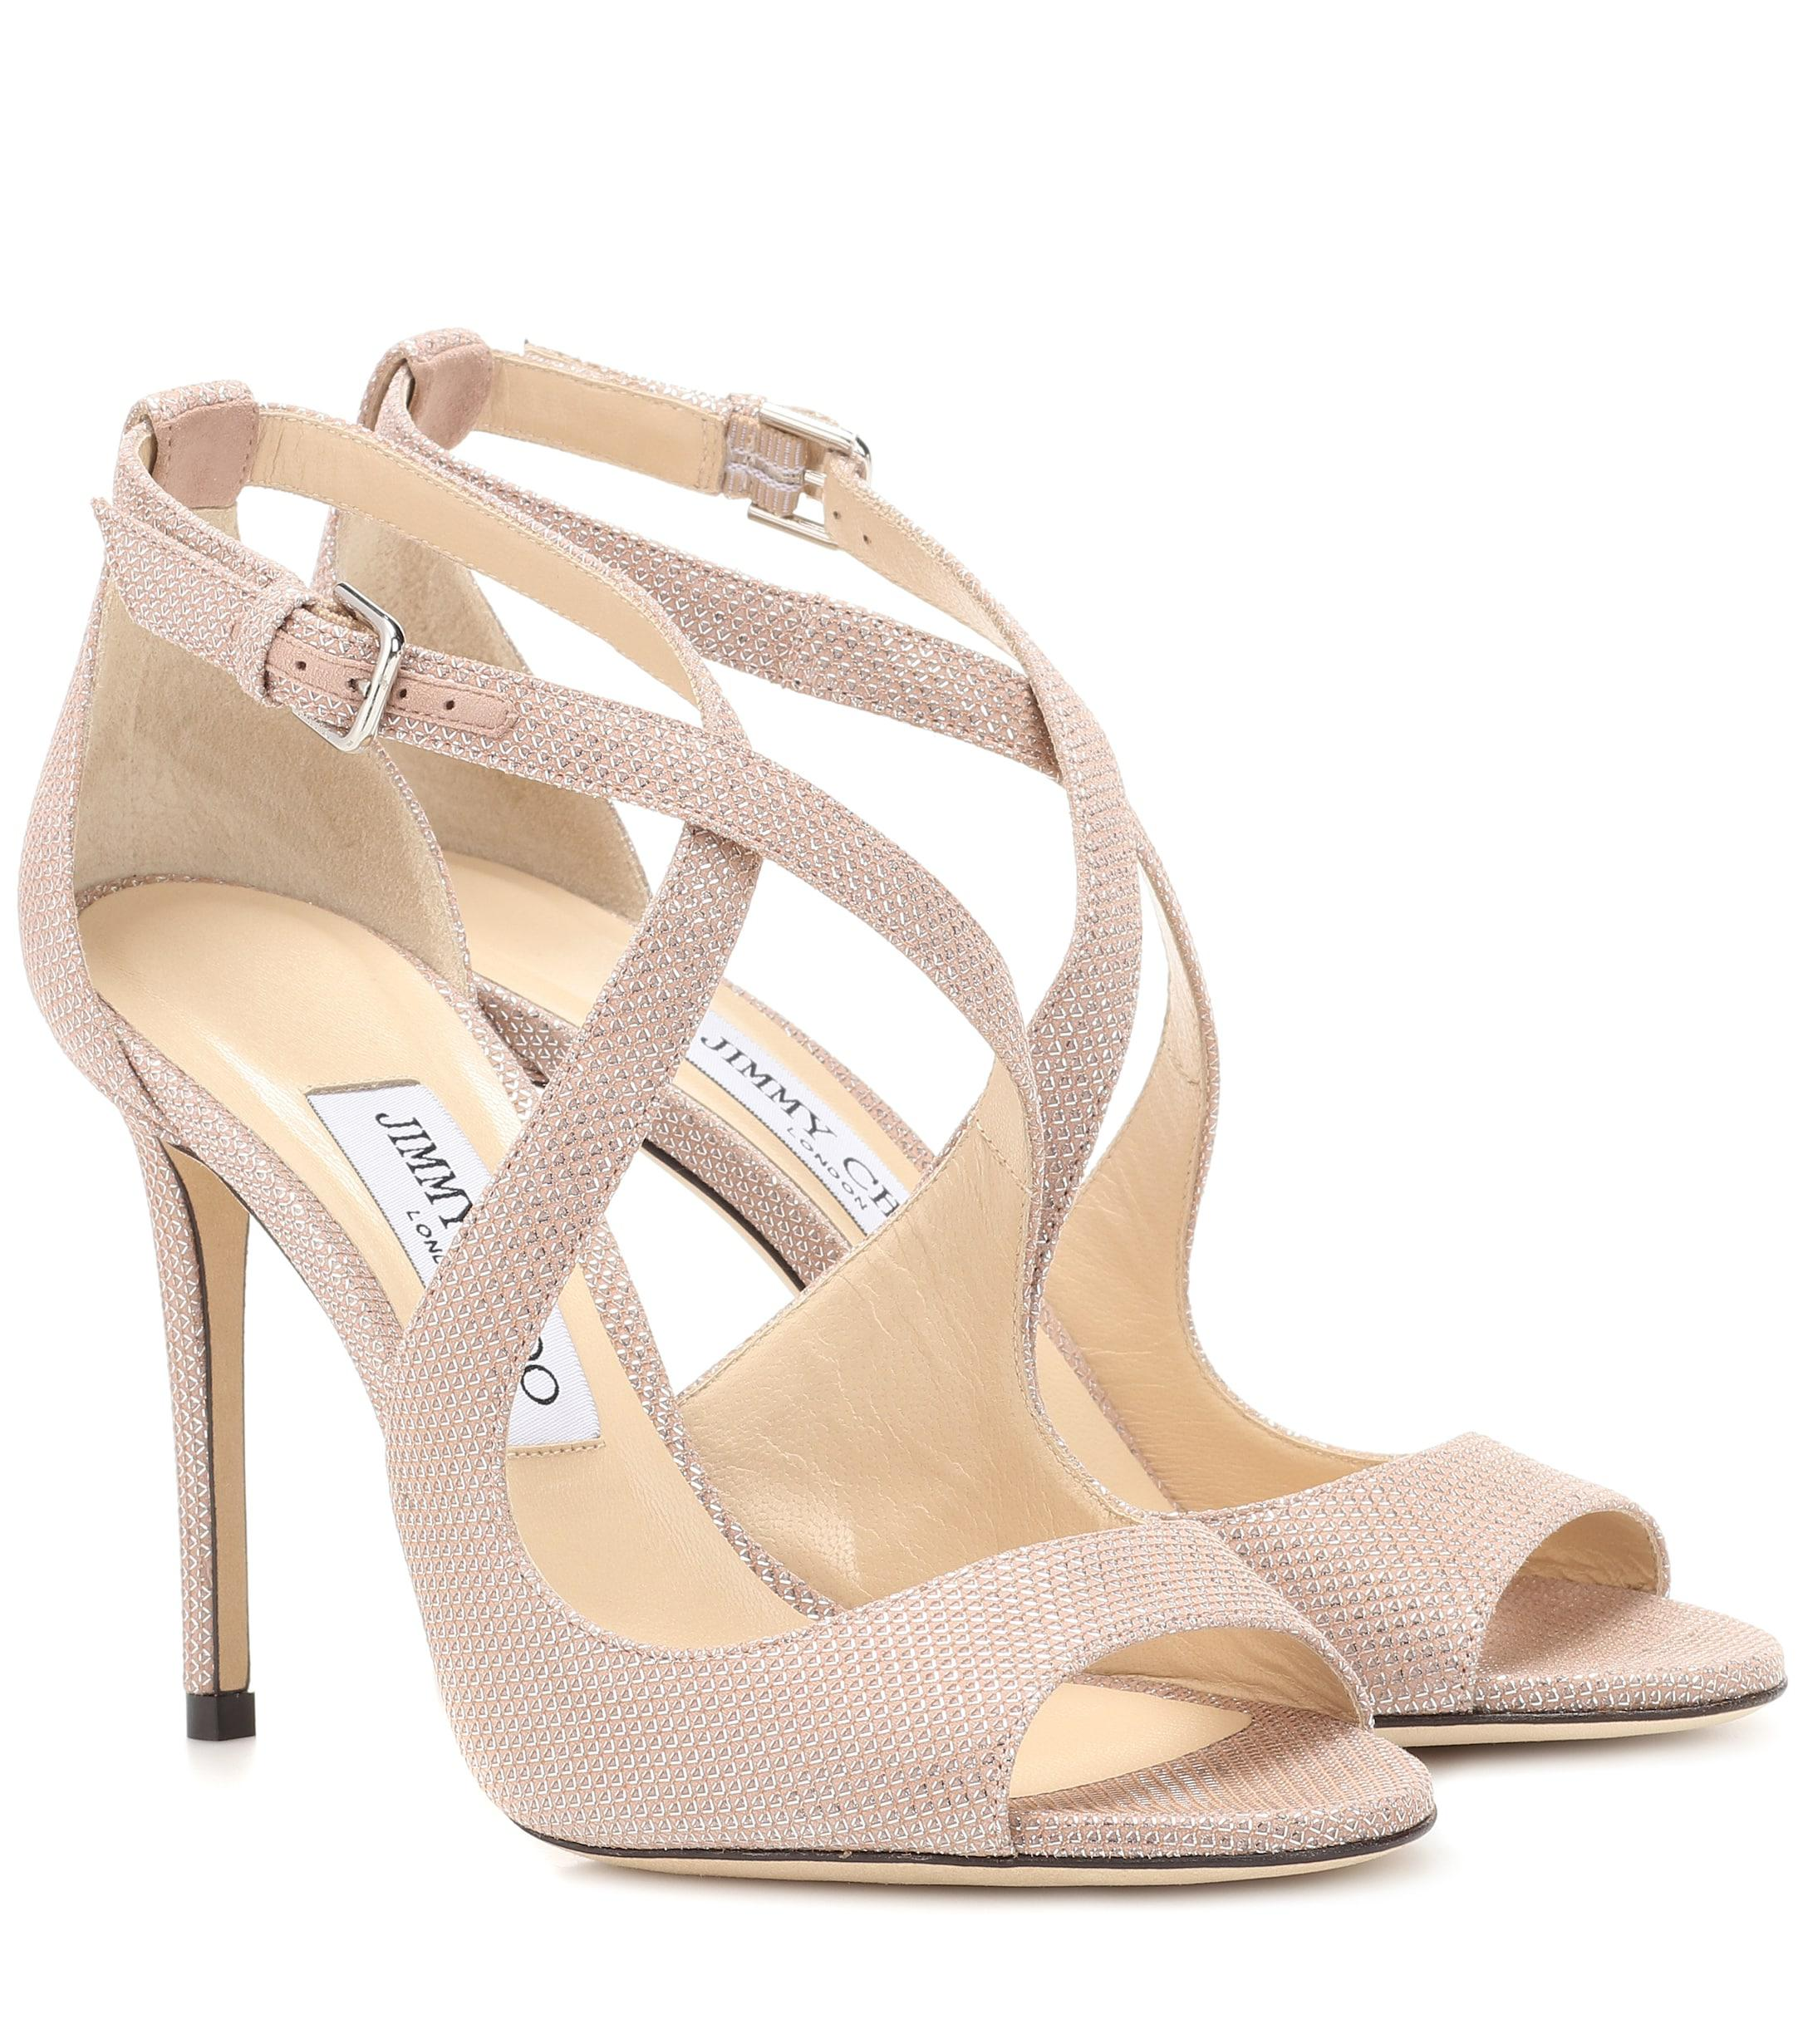 efa58d148b23 Lyst - Jimmy Choo Emily 100 Sandals in Pink